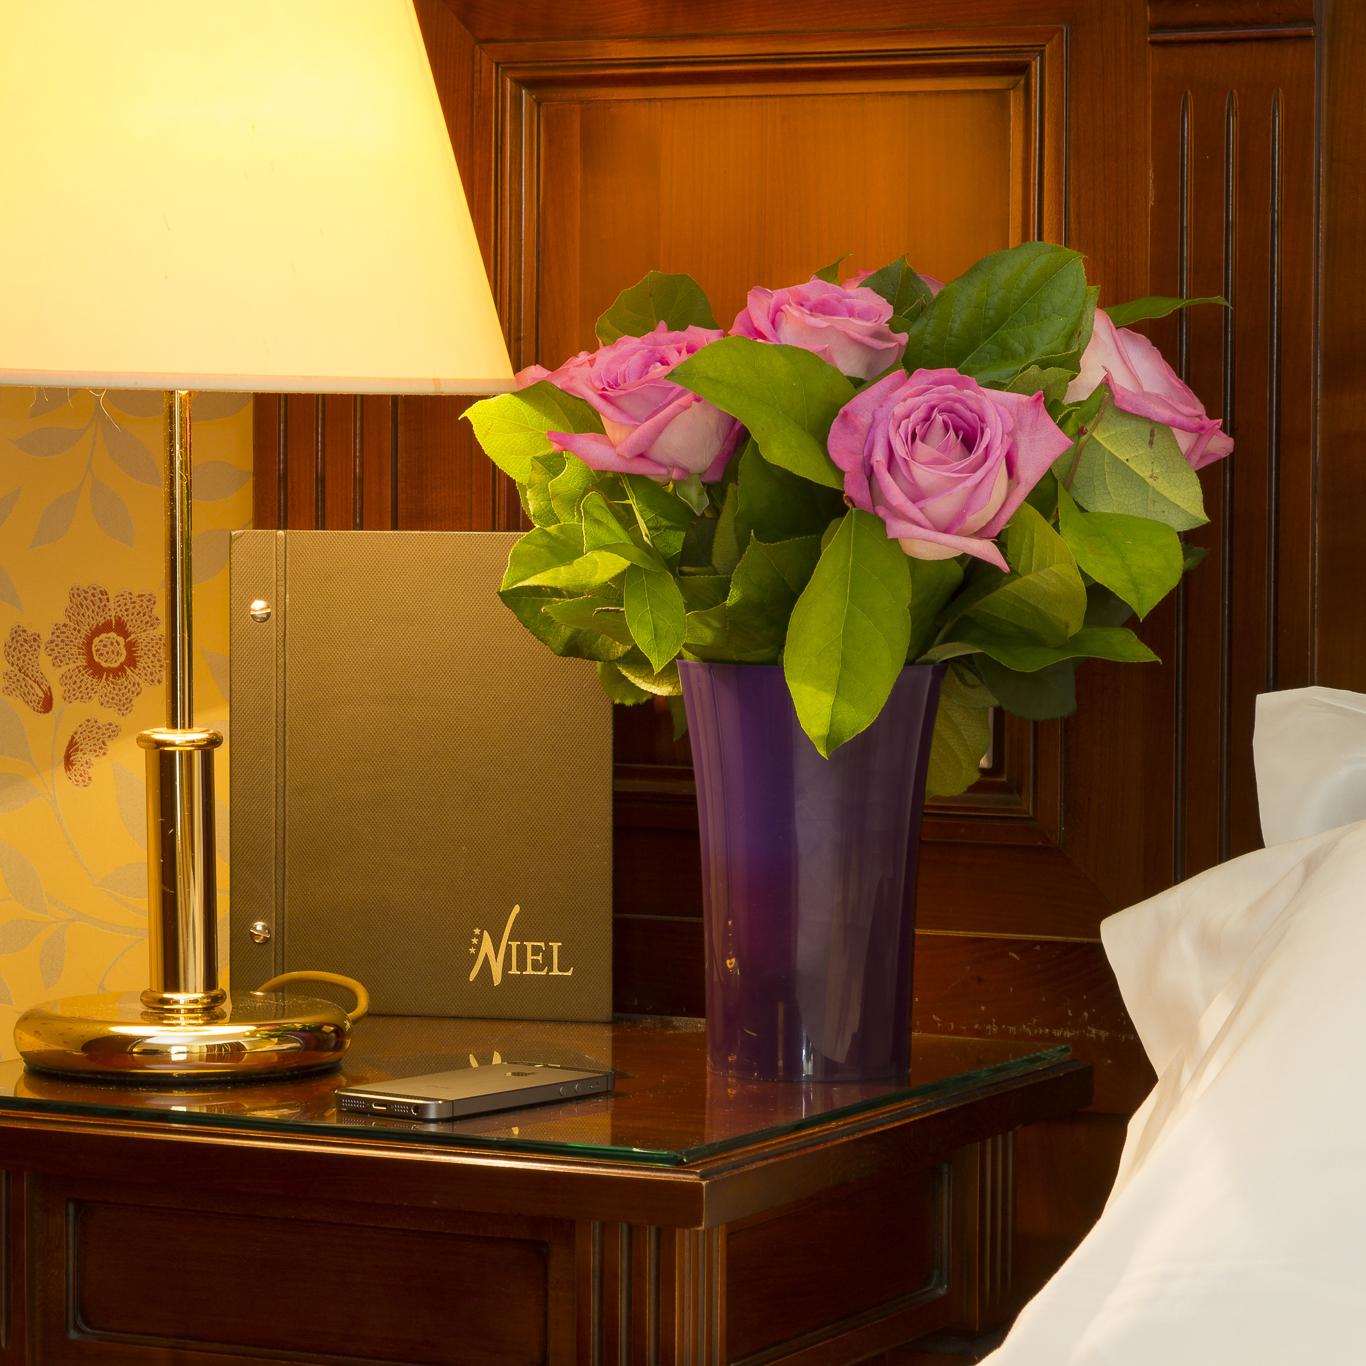 Hotel niel 75017 paris for Hotels 75017